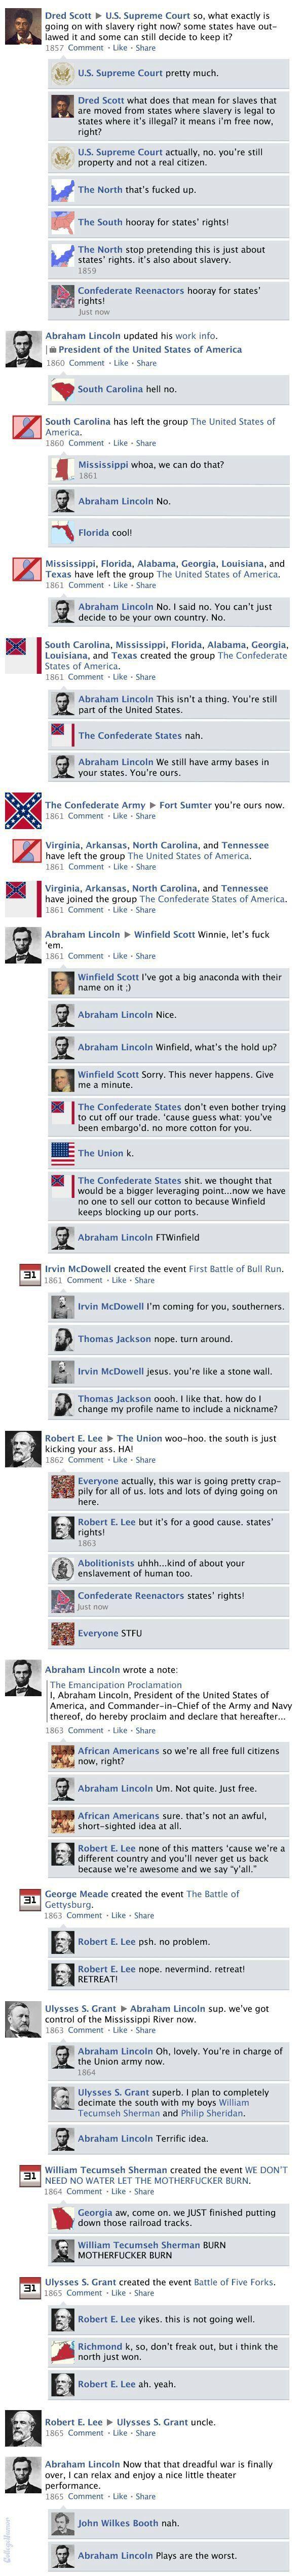 Civil War On Facebook History Humor History Jokes World History